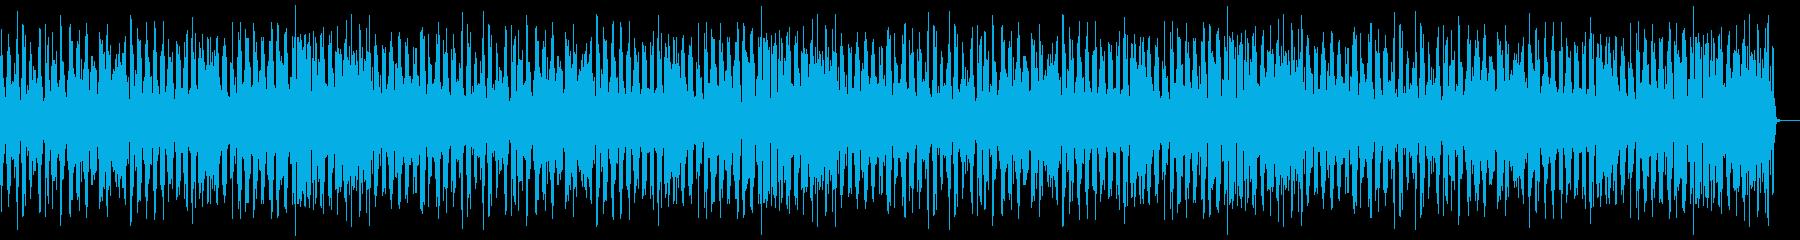 AMGアナログFX 44の再生済みの波形